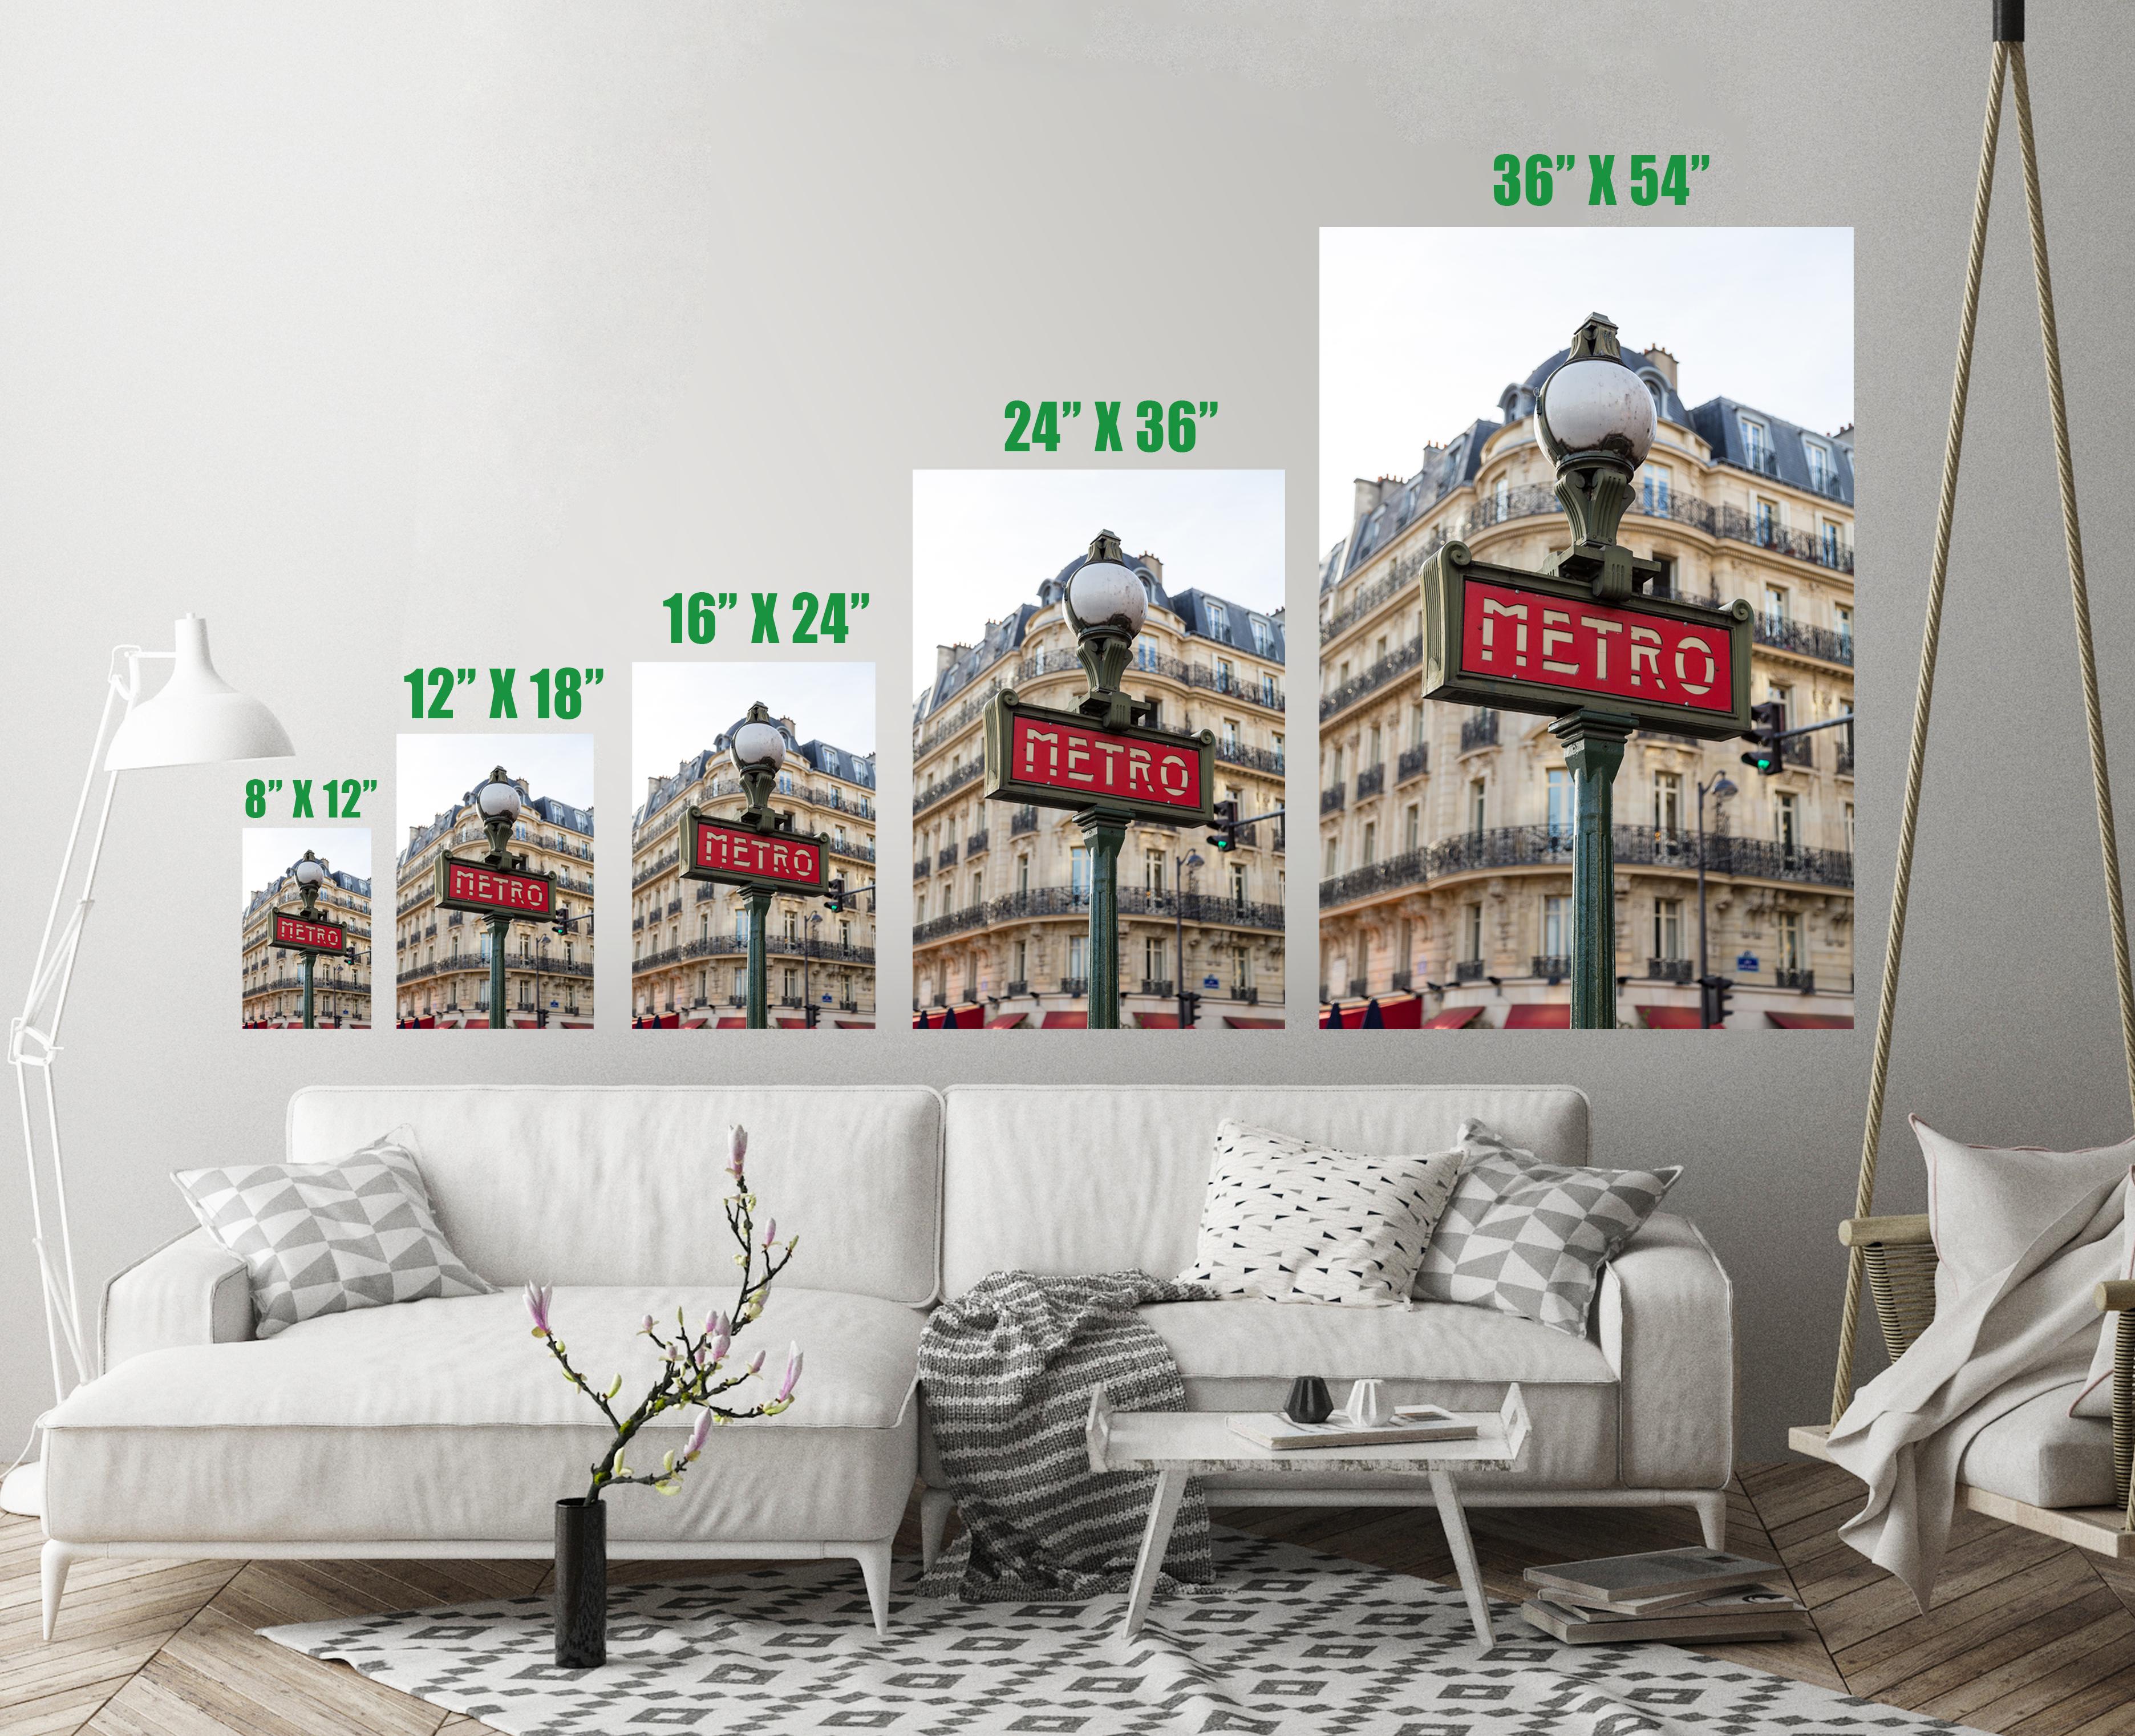 Metro Sign Street Lamp Paris France Art Print Wall Decor Image ...